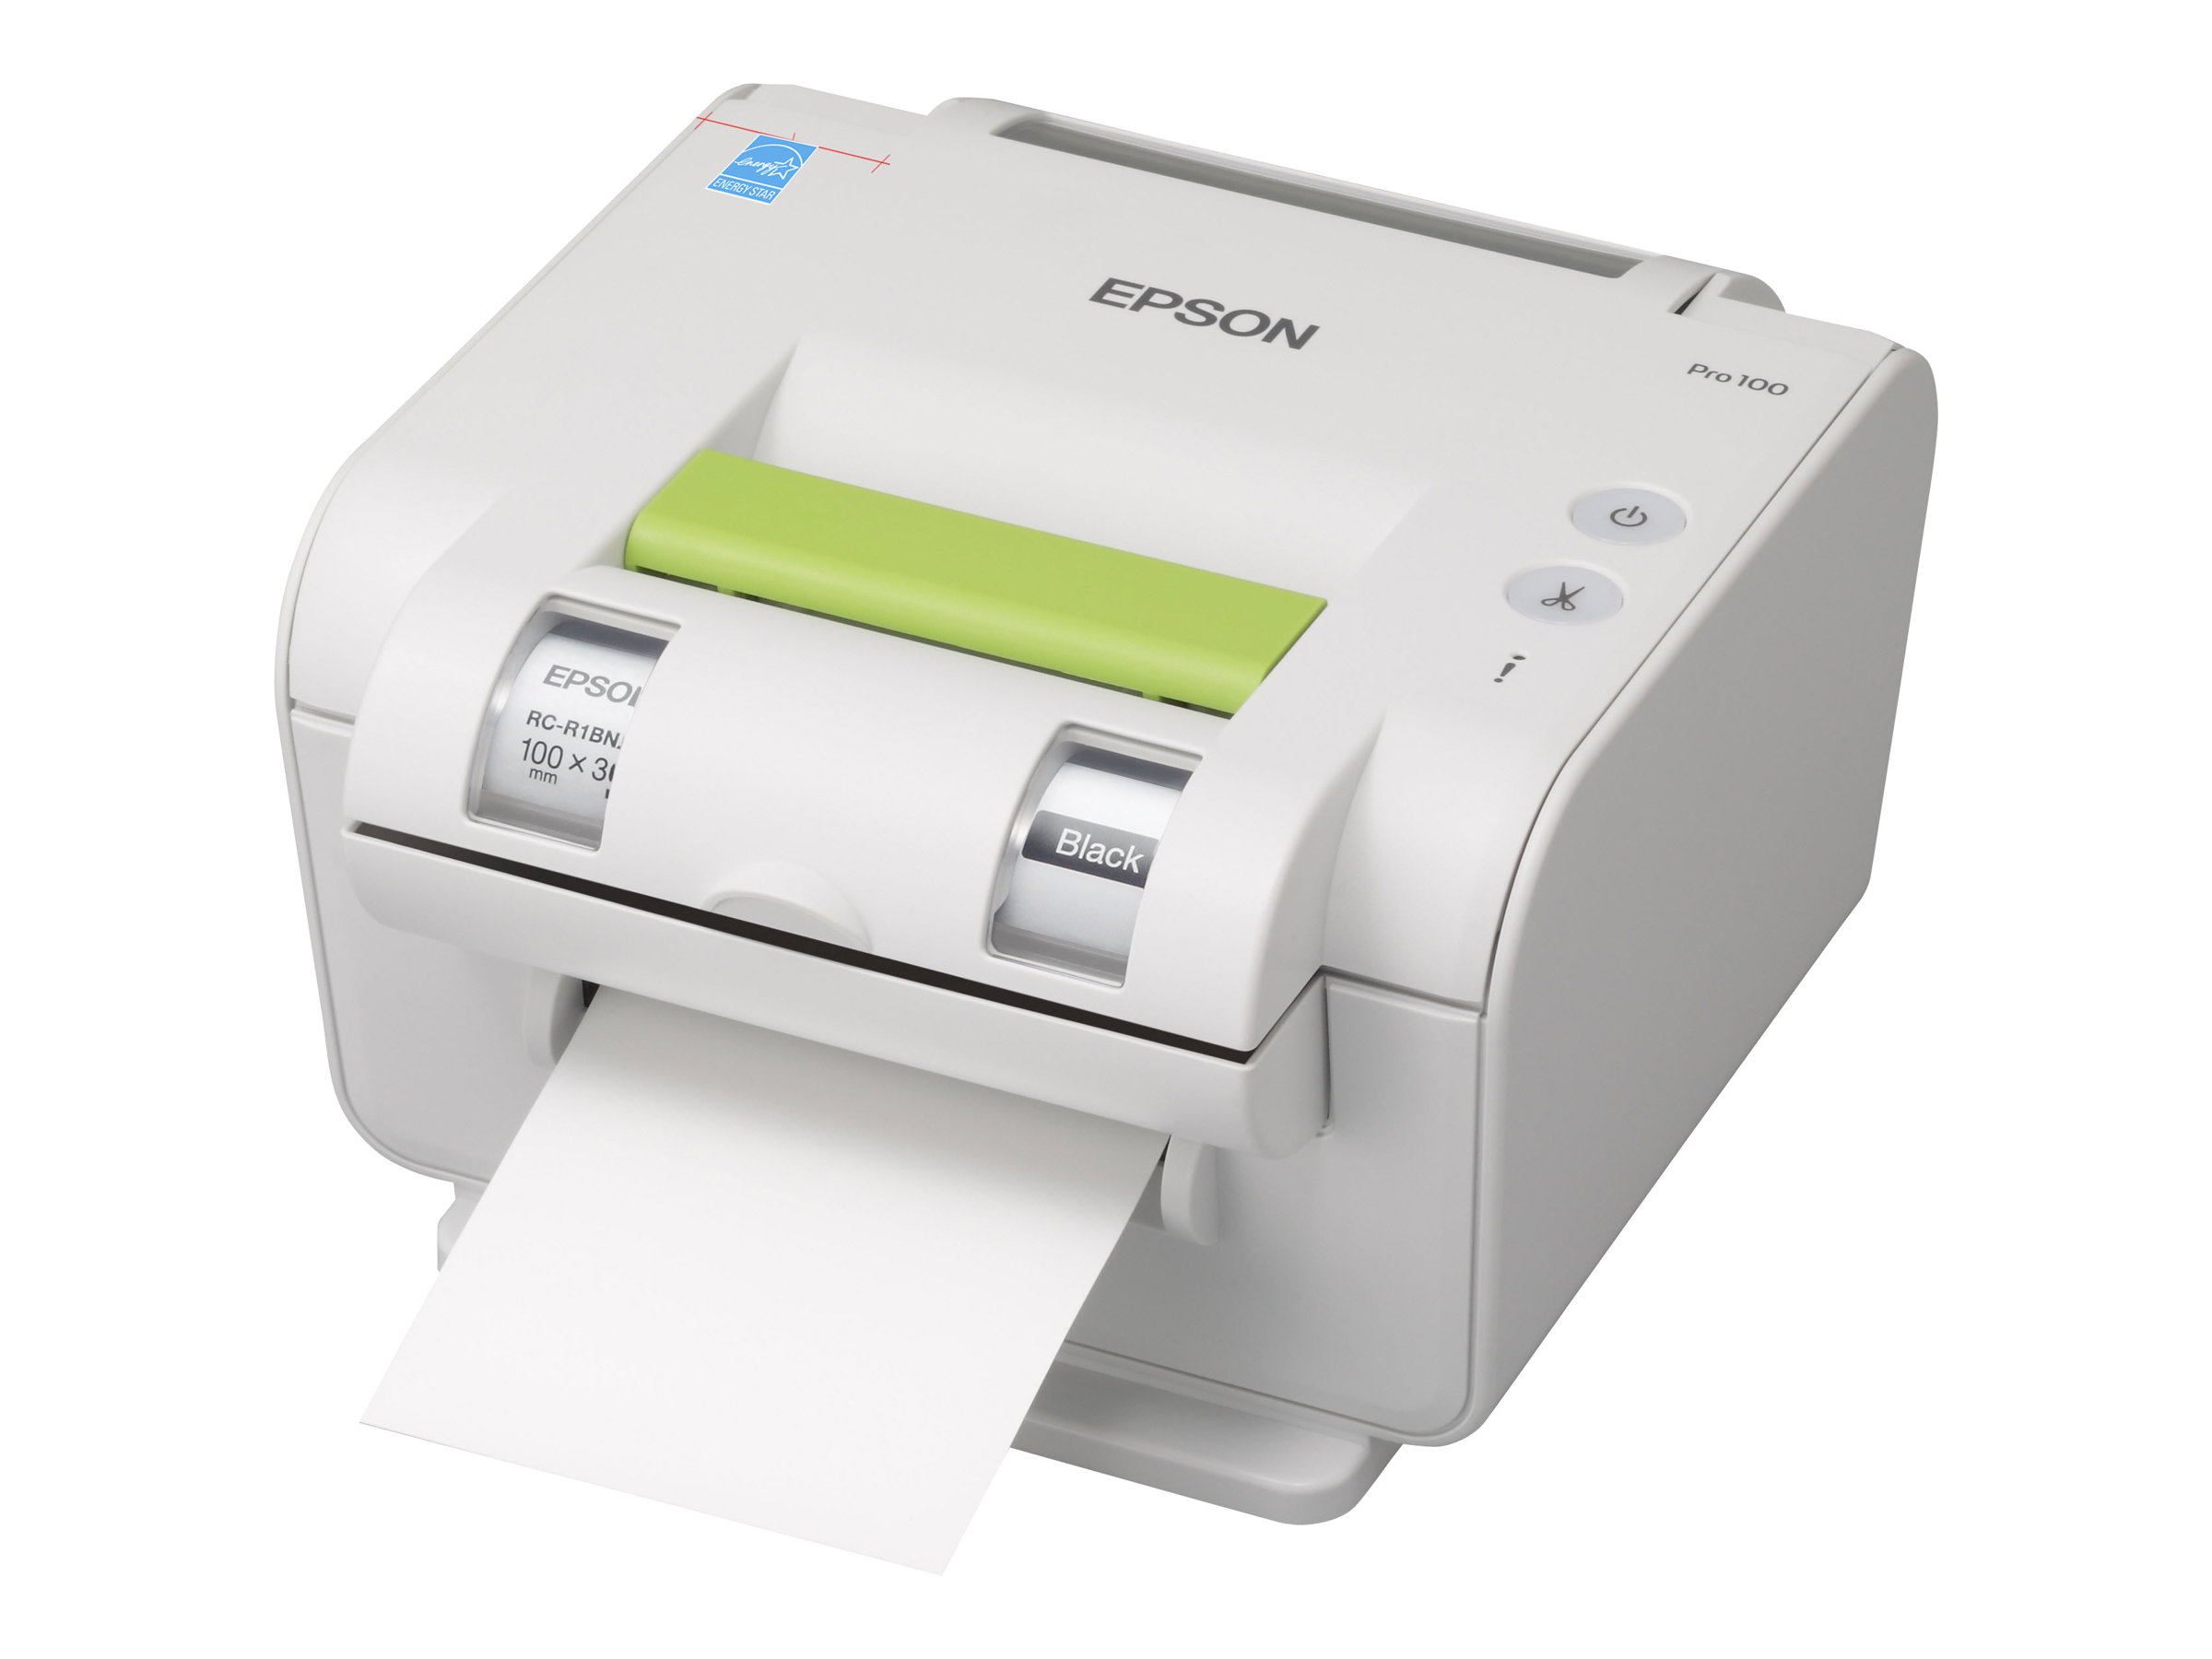 Epson LabelWorks Pro100 - Beschriftungsgerät - s/w - Thermodirekt / Thermotransfer - Rolle (1 cm) - 300 dpi